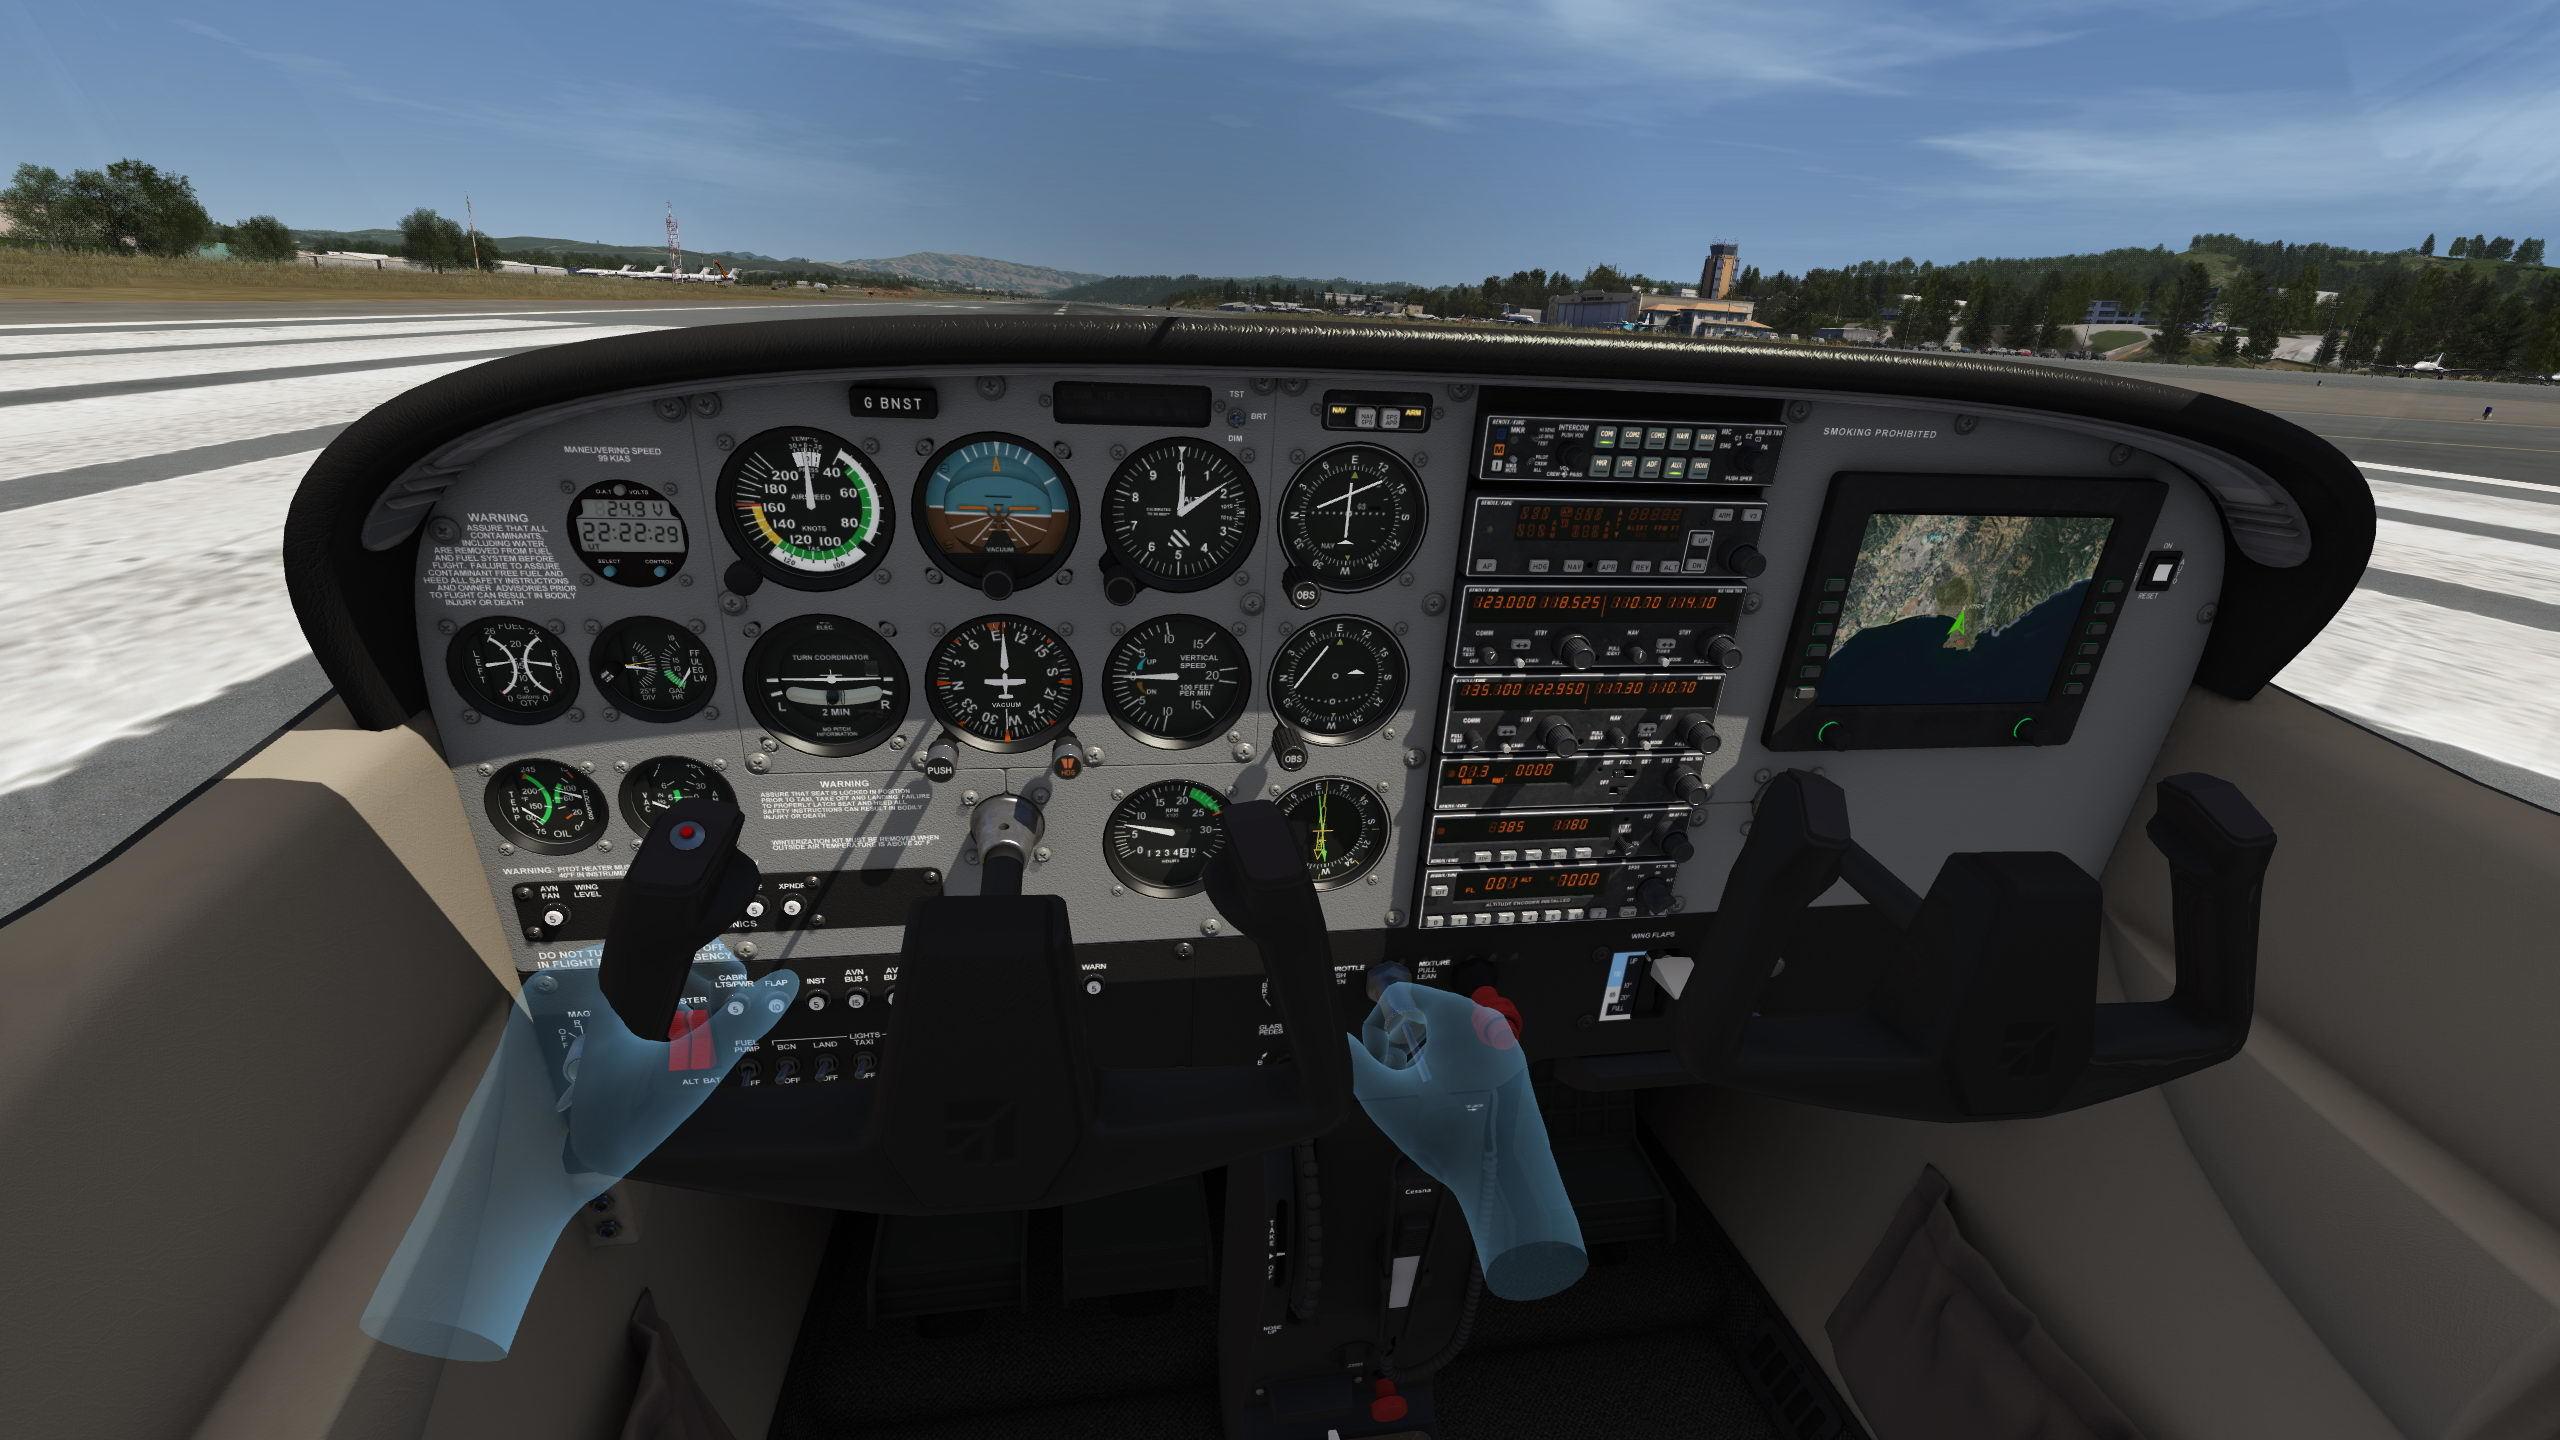 Aerofly FS 2 - (First Look) New Simulator! - YouTube